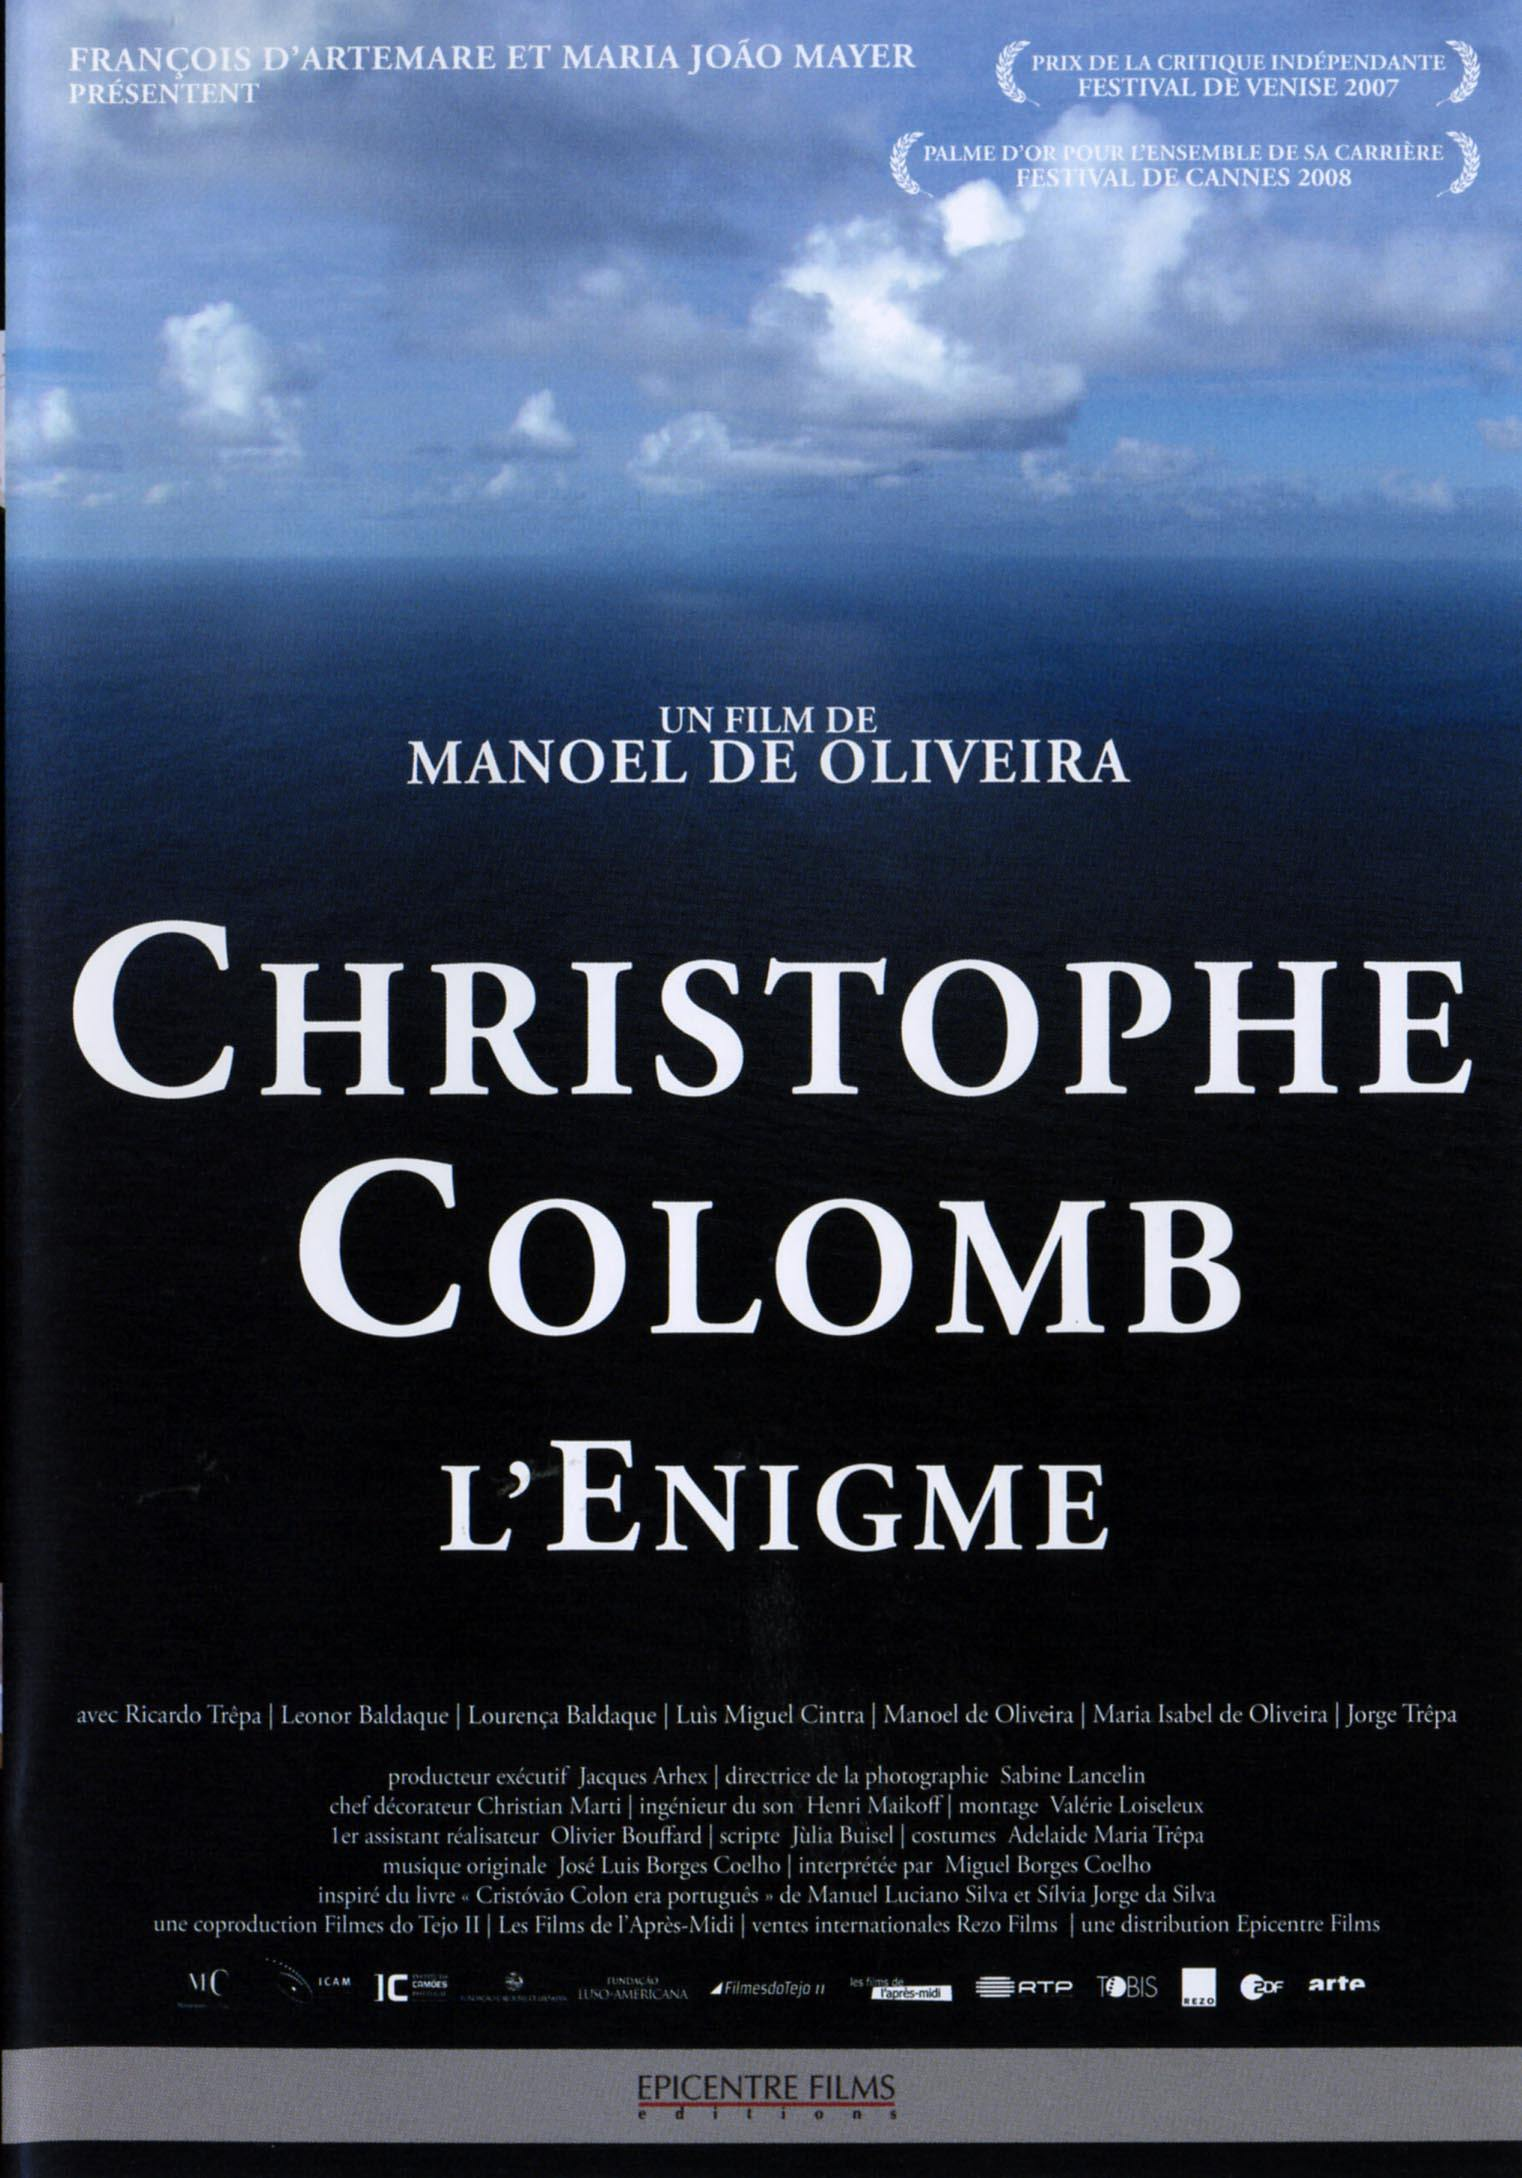 Christophe colomb - dvd  l'enigme